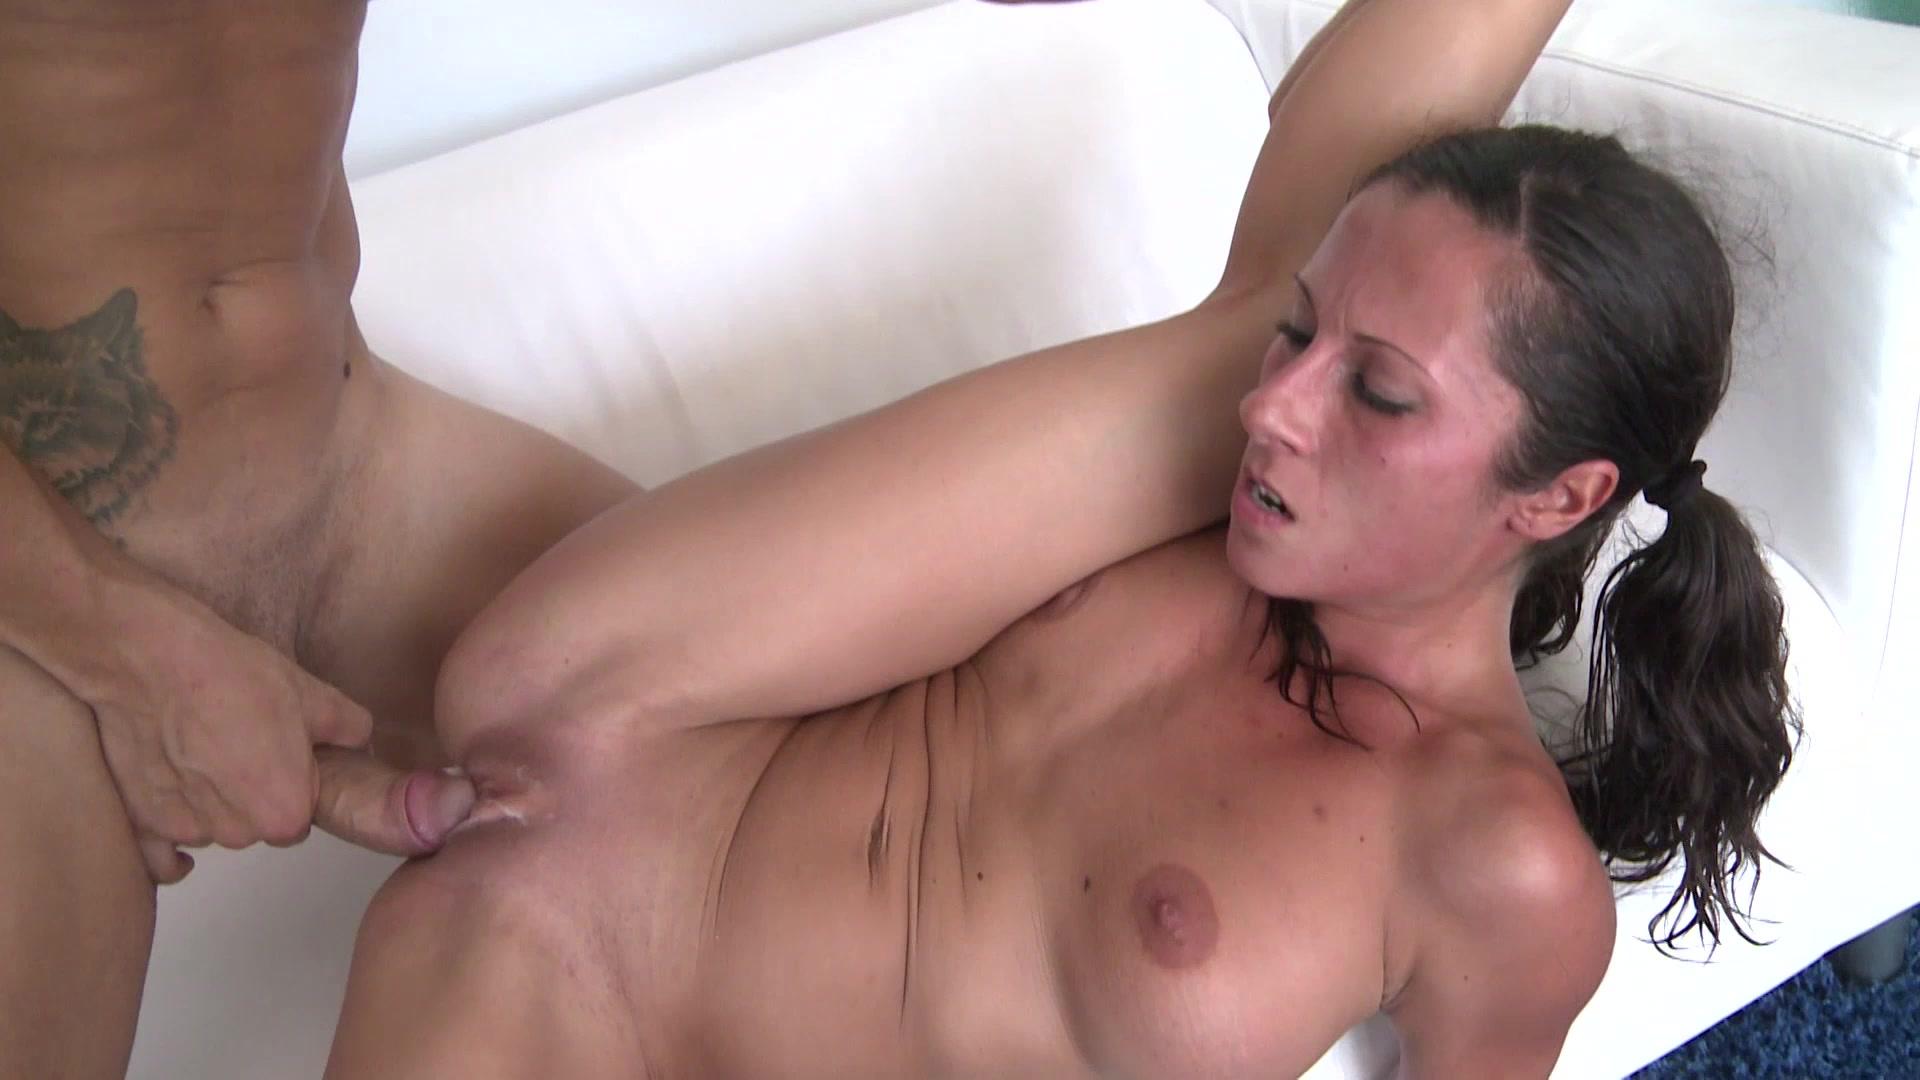 Noemi Jolie Deep Throats a Massive Cock Before it Goes in Her Pussy Starring: Noemi Jolie Length: 42 min